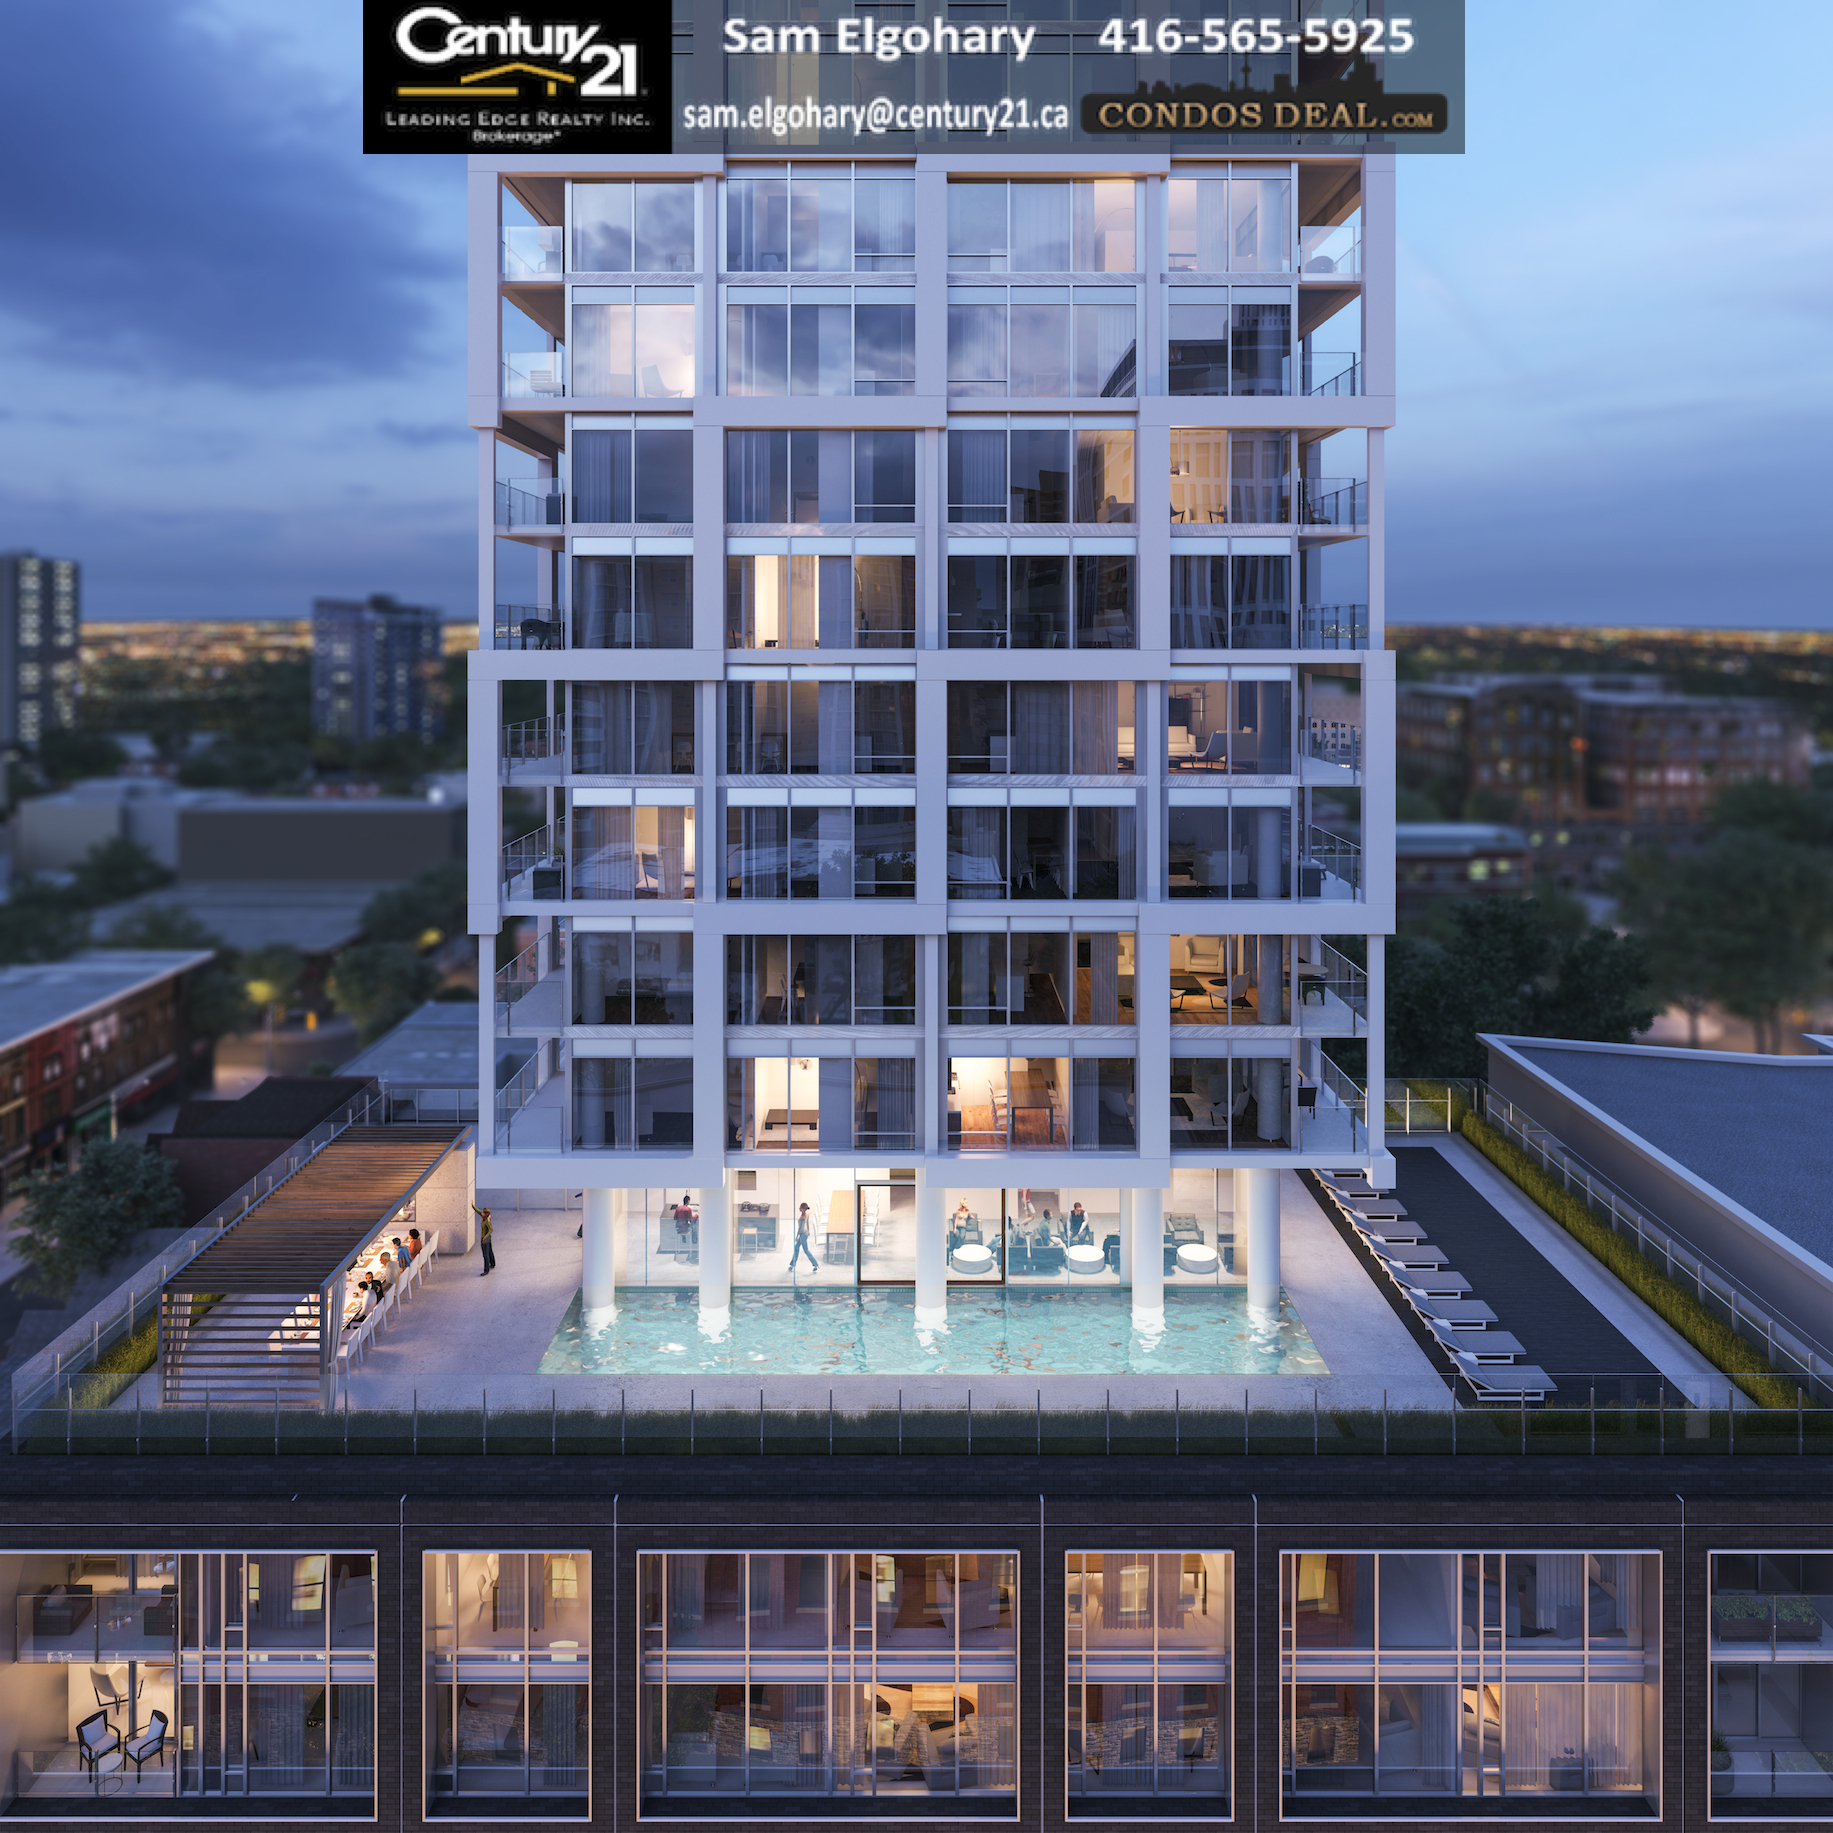 East 55 Condos 55 Ontario St Vip Access Floor Plans Condos Deal